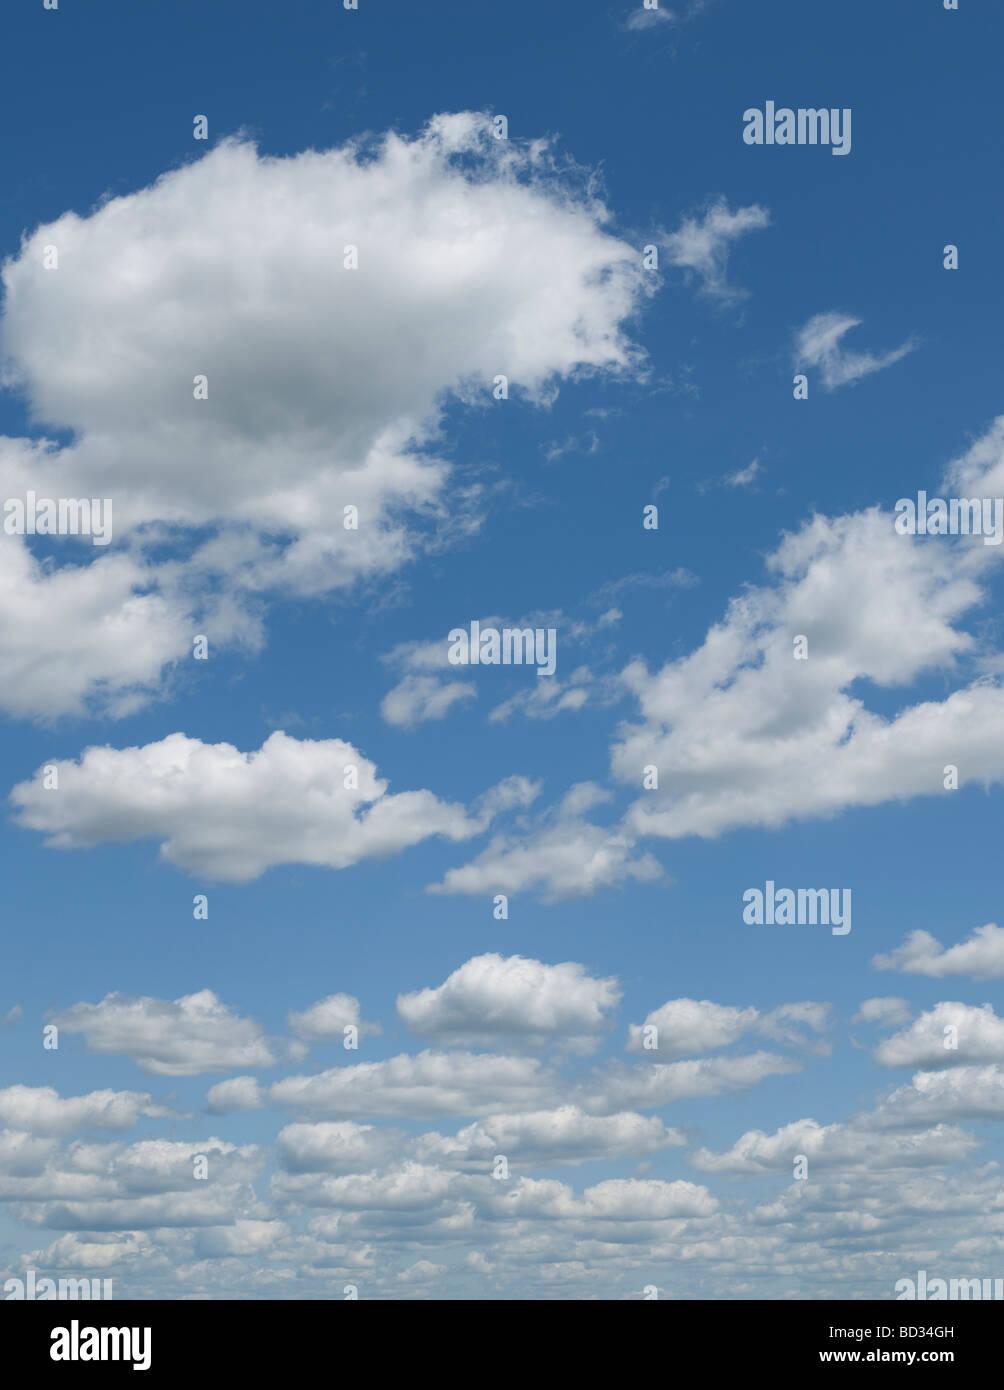 Ciel bleu nuages gonflés Photo Stock